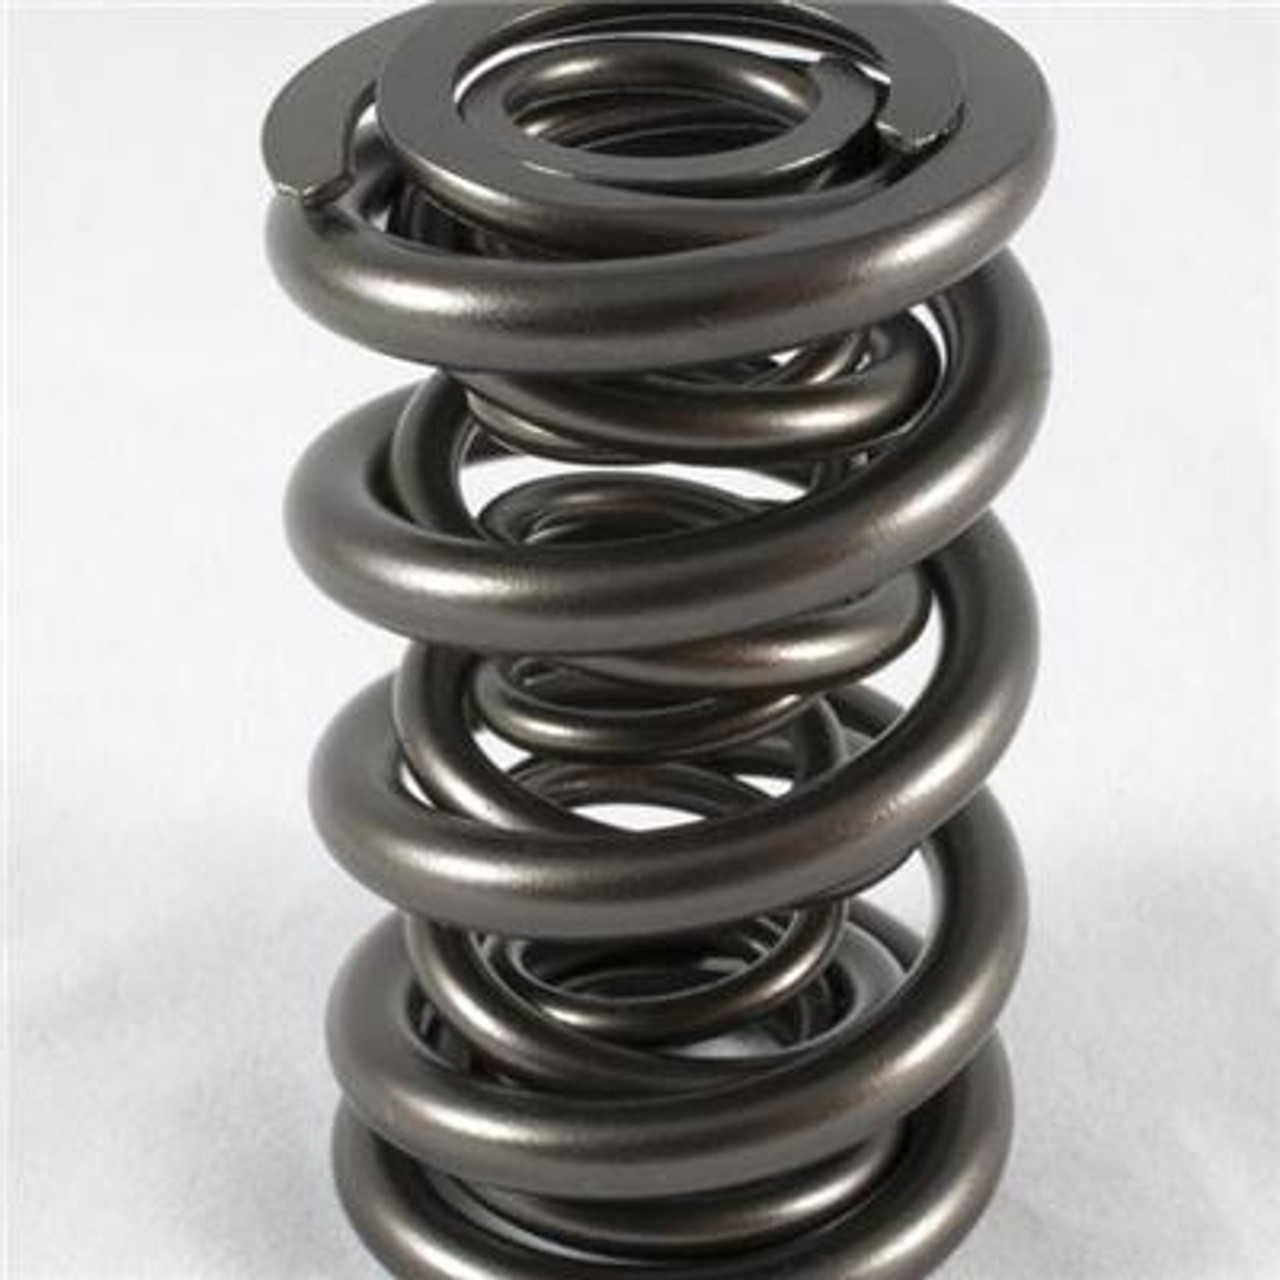 PAC-1248 •Seat Pressure: 332 LBS @ 2.100Open Pressure: 950 LBS @ 1.200 Coil Bind: 1.130 Max Lift: .900 16/pkg